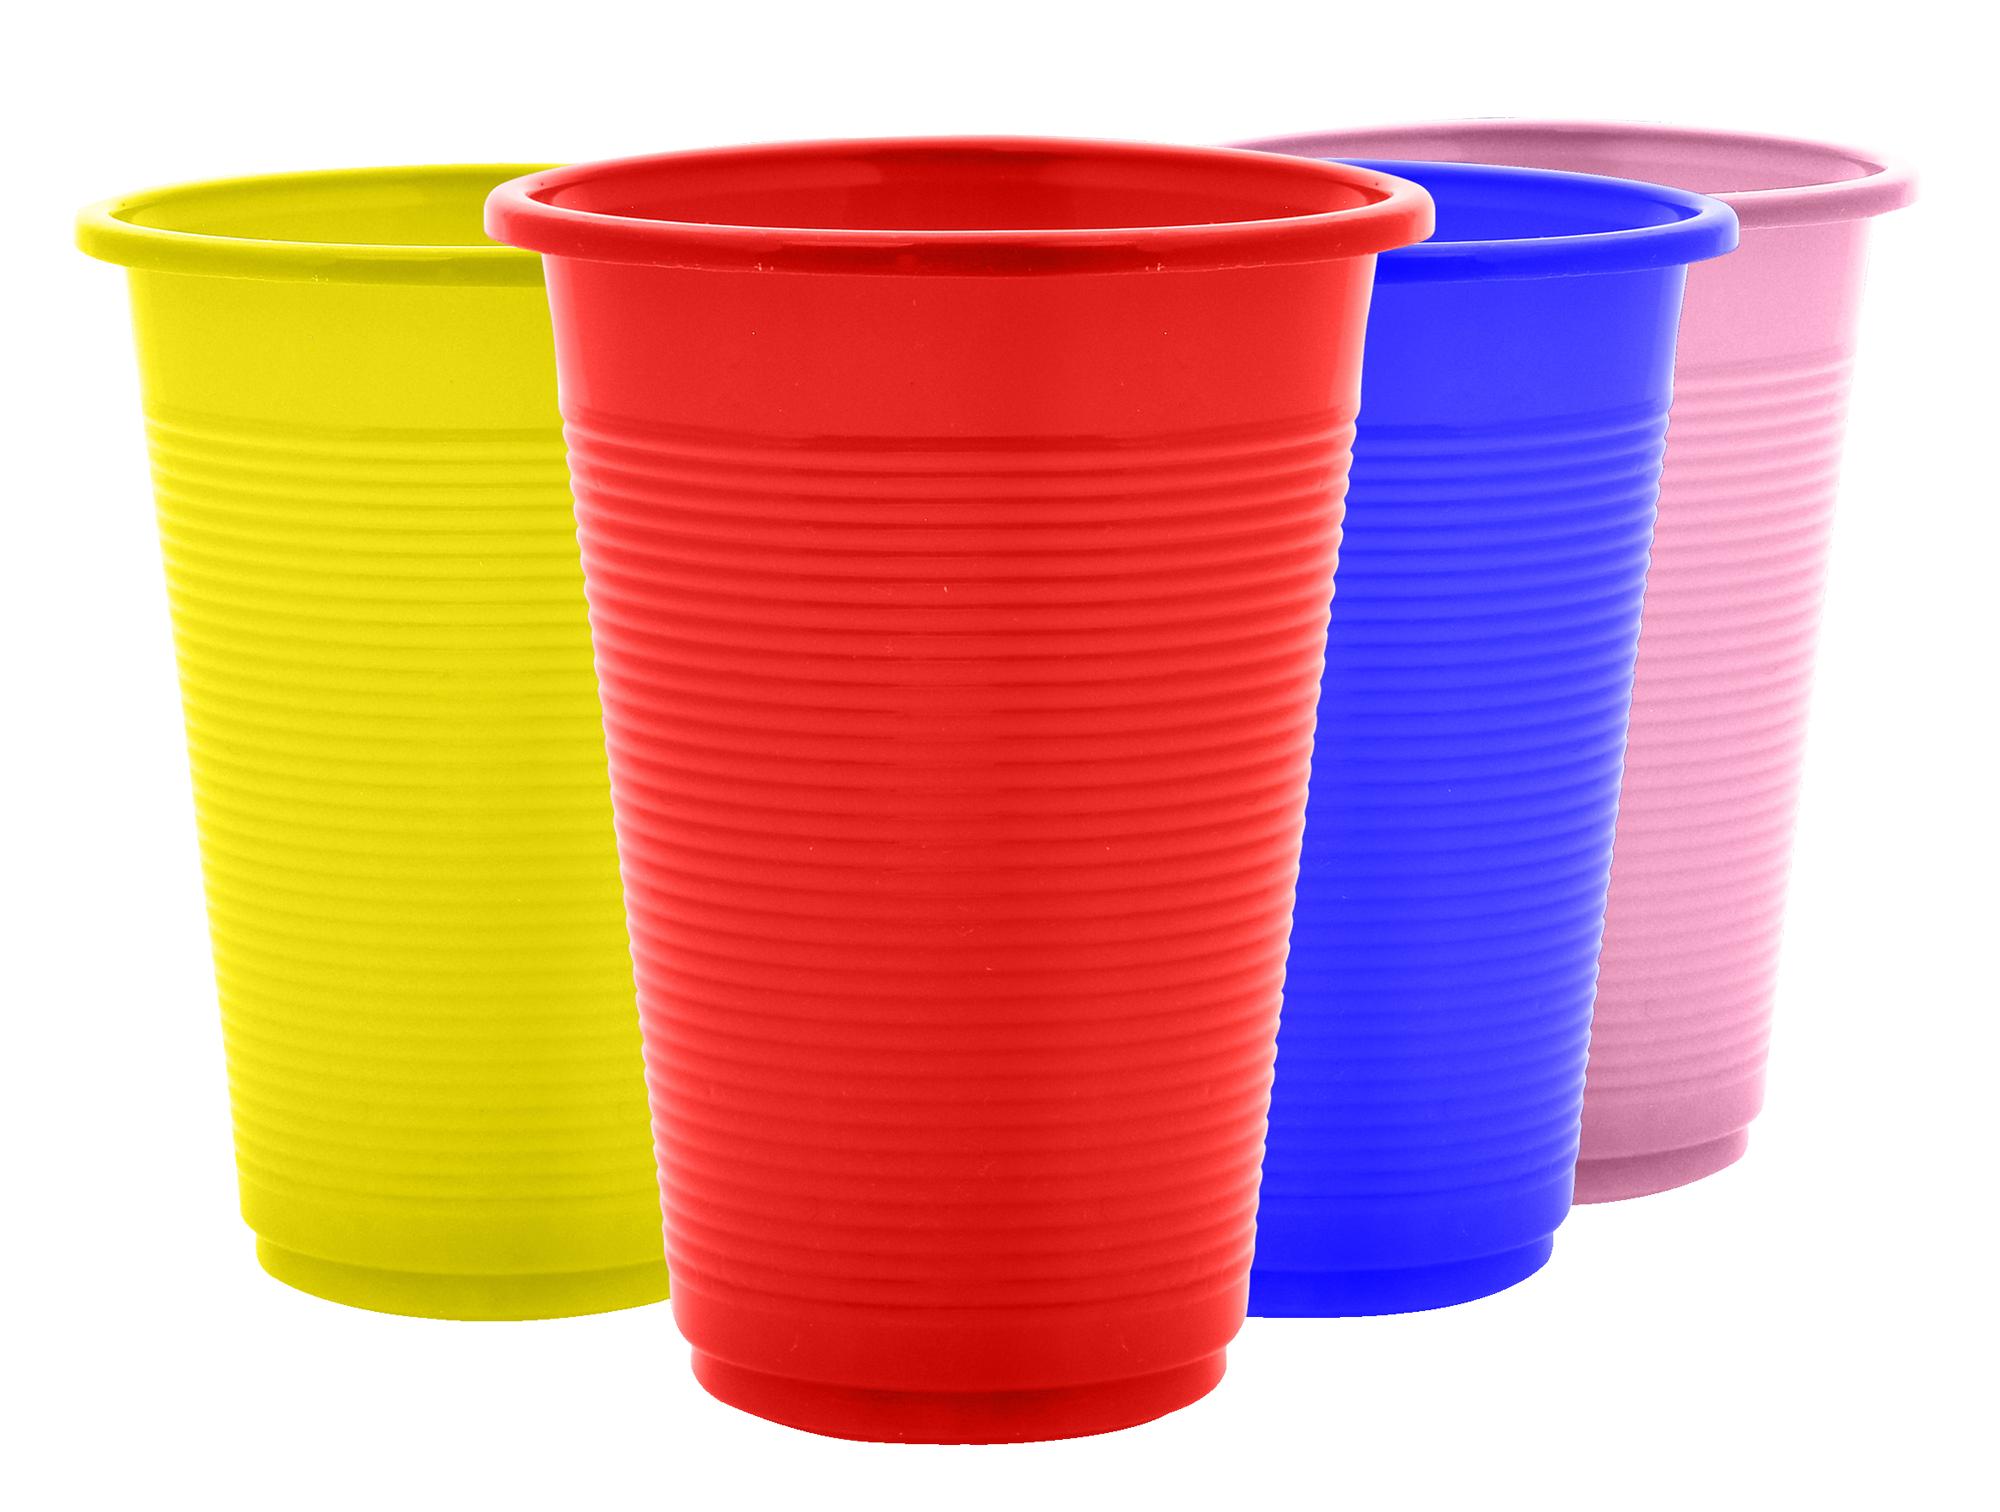 Cup png images pngpix. Mug clipart plastic mug